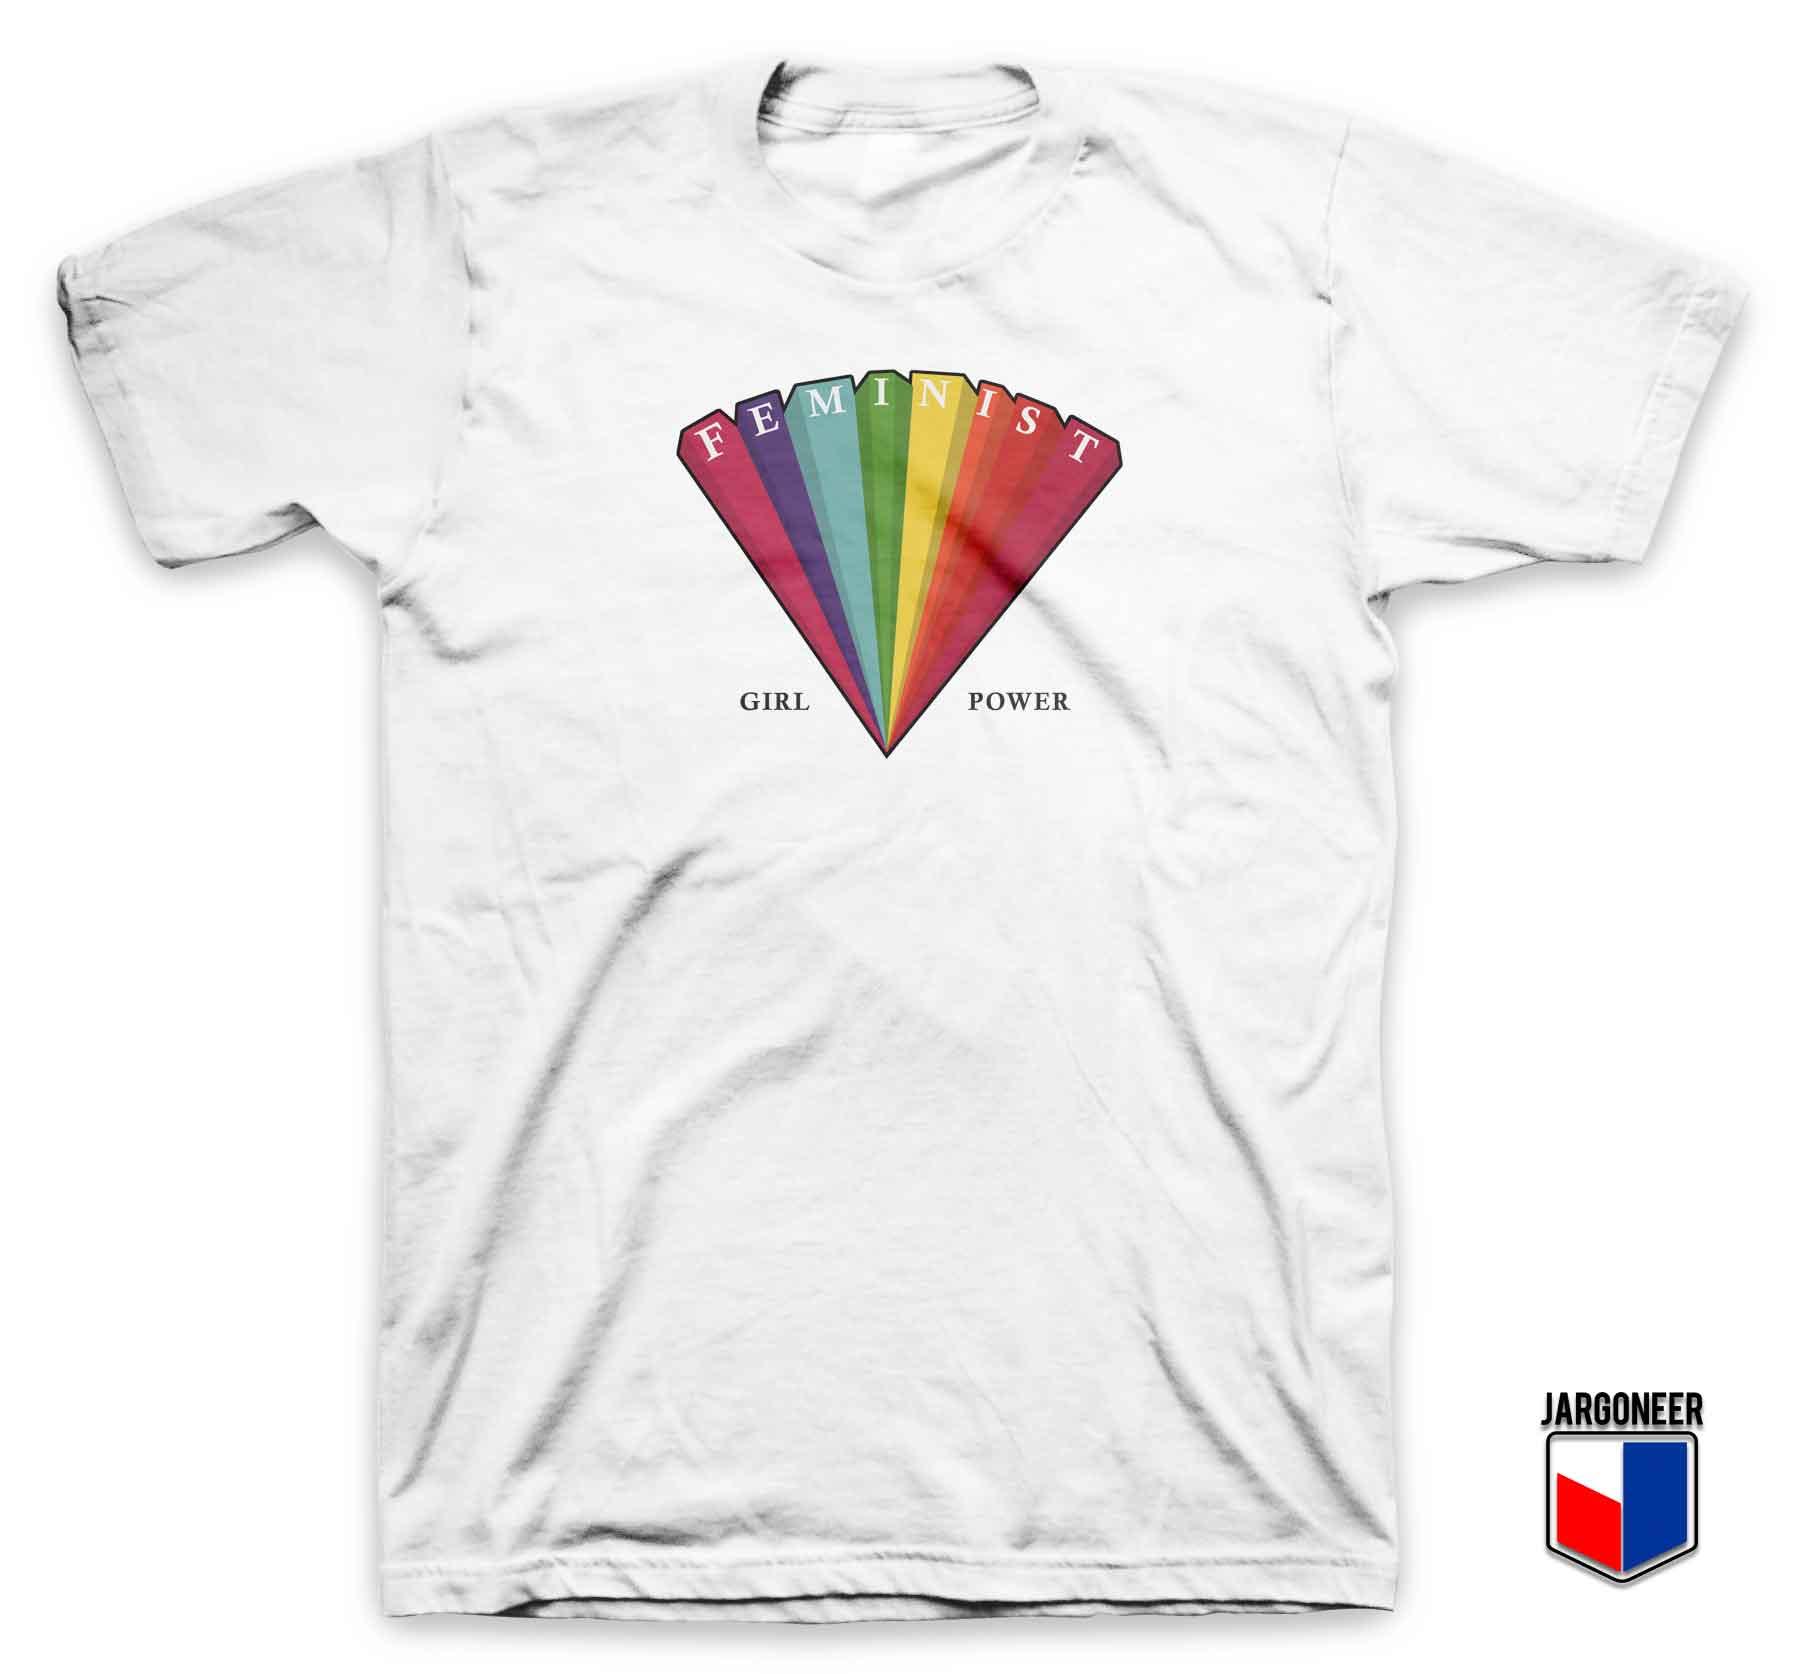 Cool Rainbow Feminist T Shirt Design | Ideas | By jargoneer.com